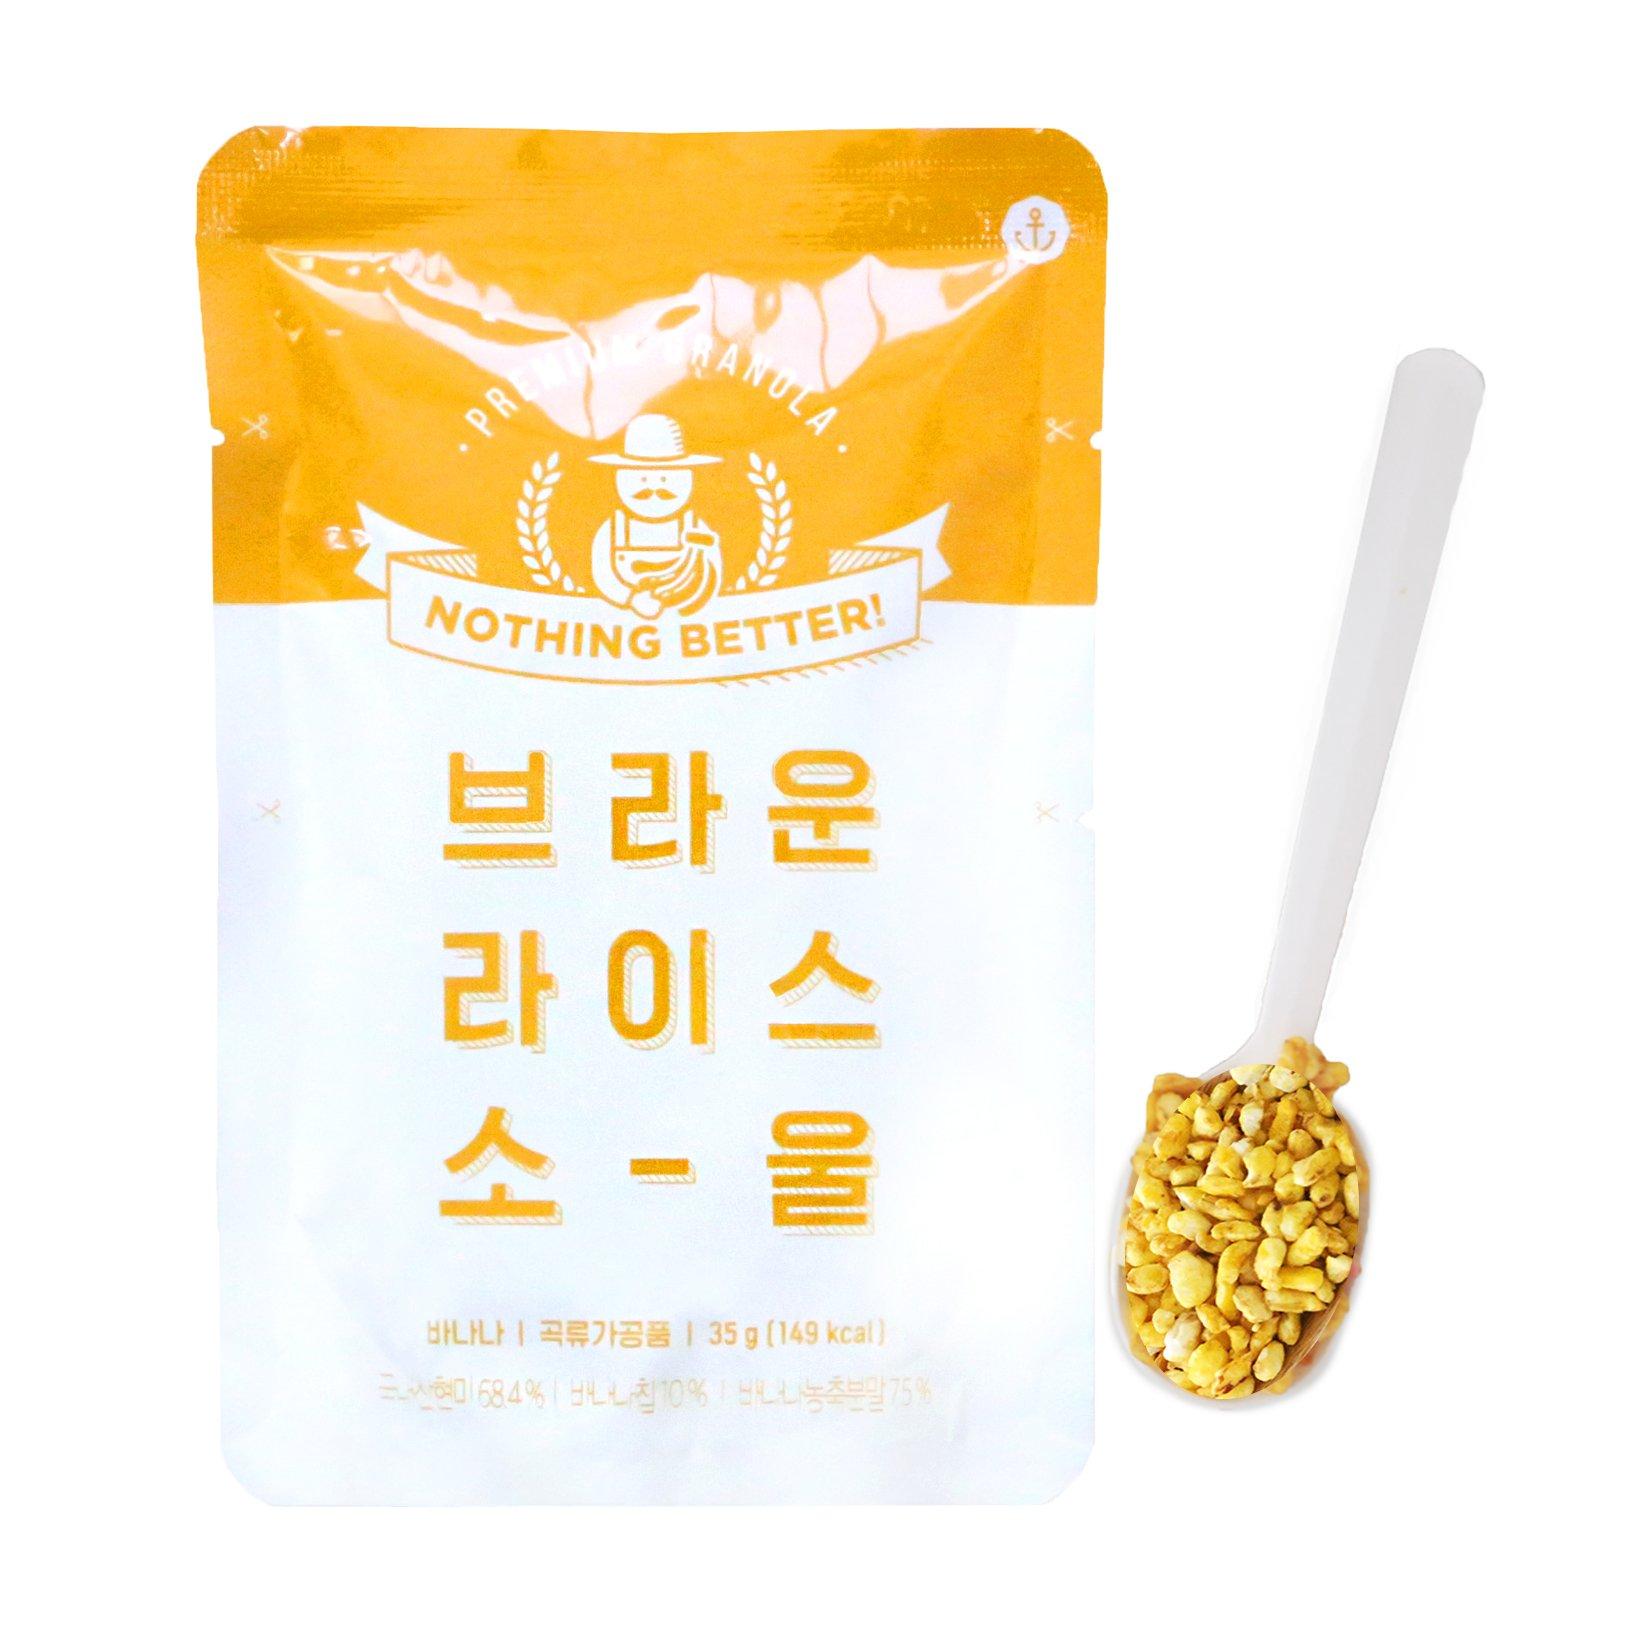 Dano Brown Rice Breakfast Cereal, Low Sugar, 1.2 Ounce, Pack of 10 (Banana)